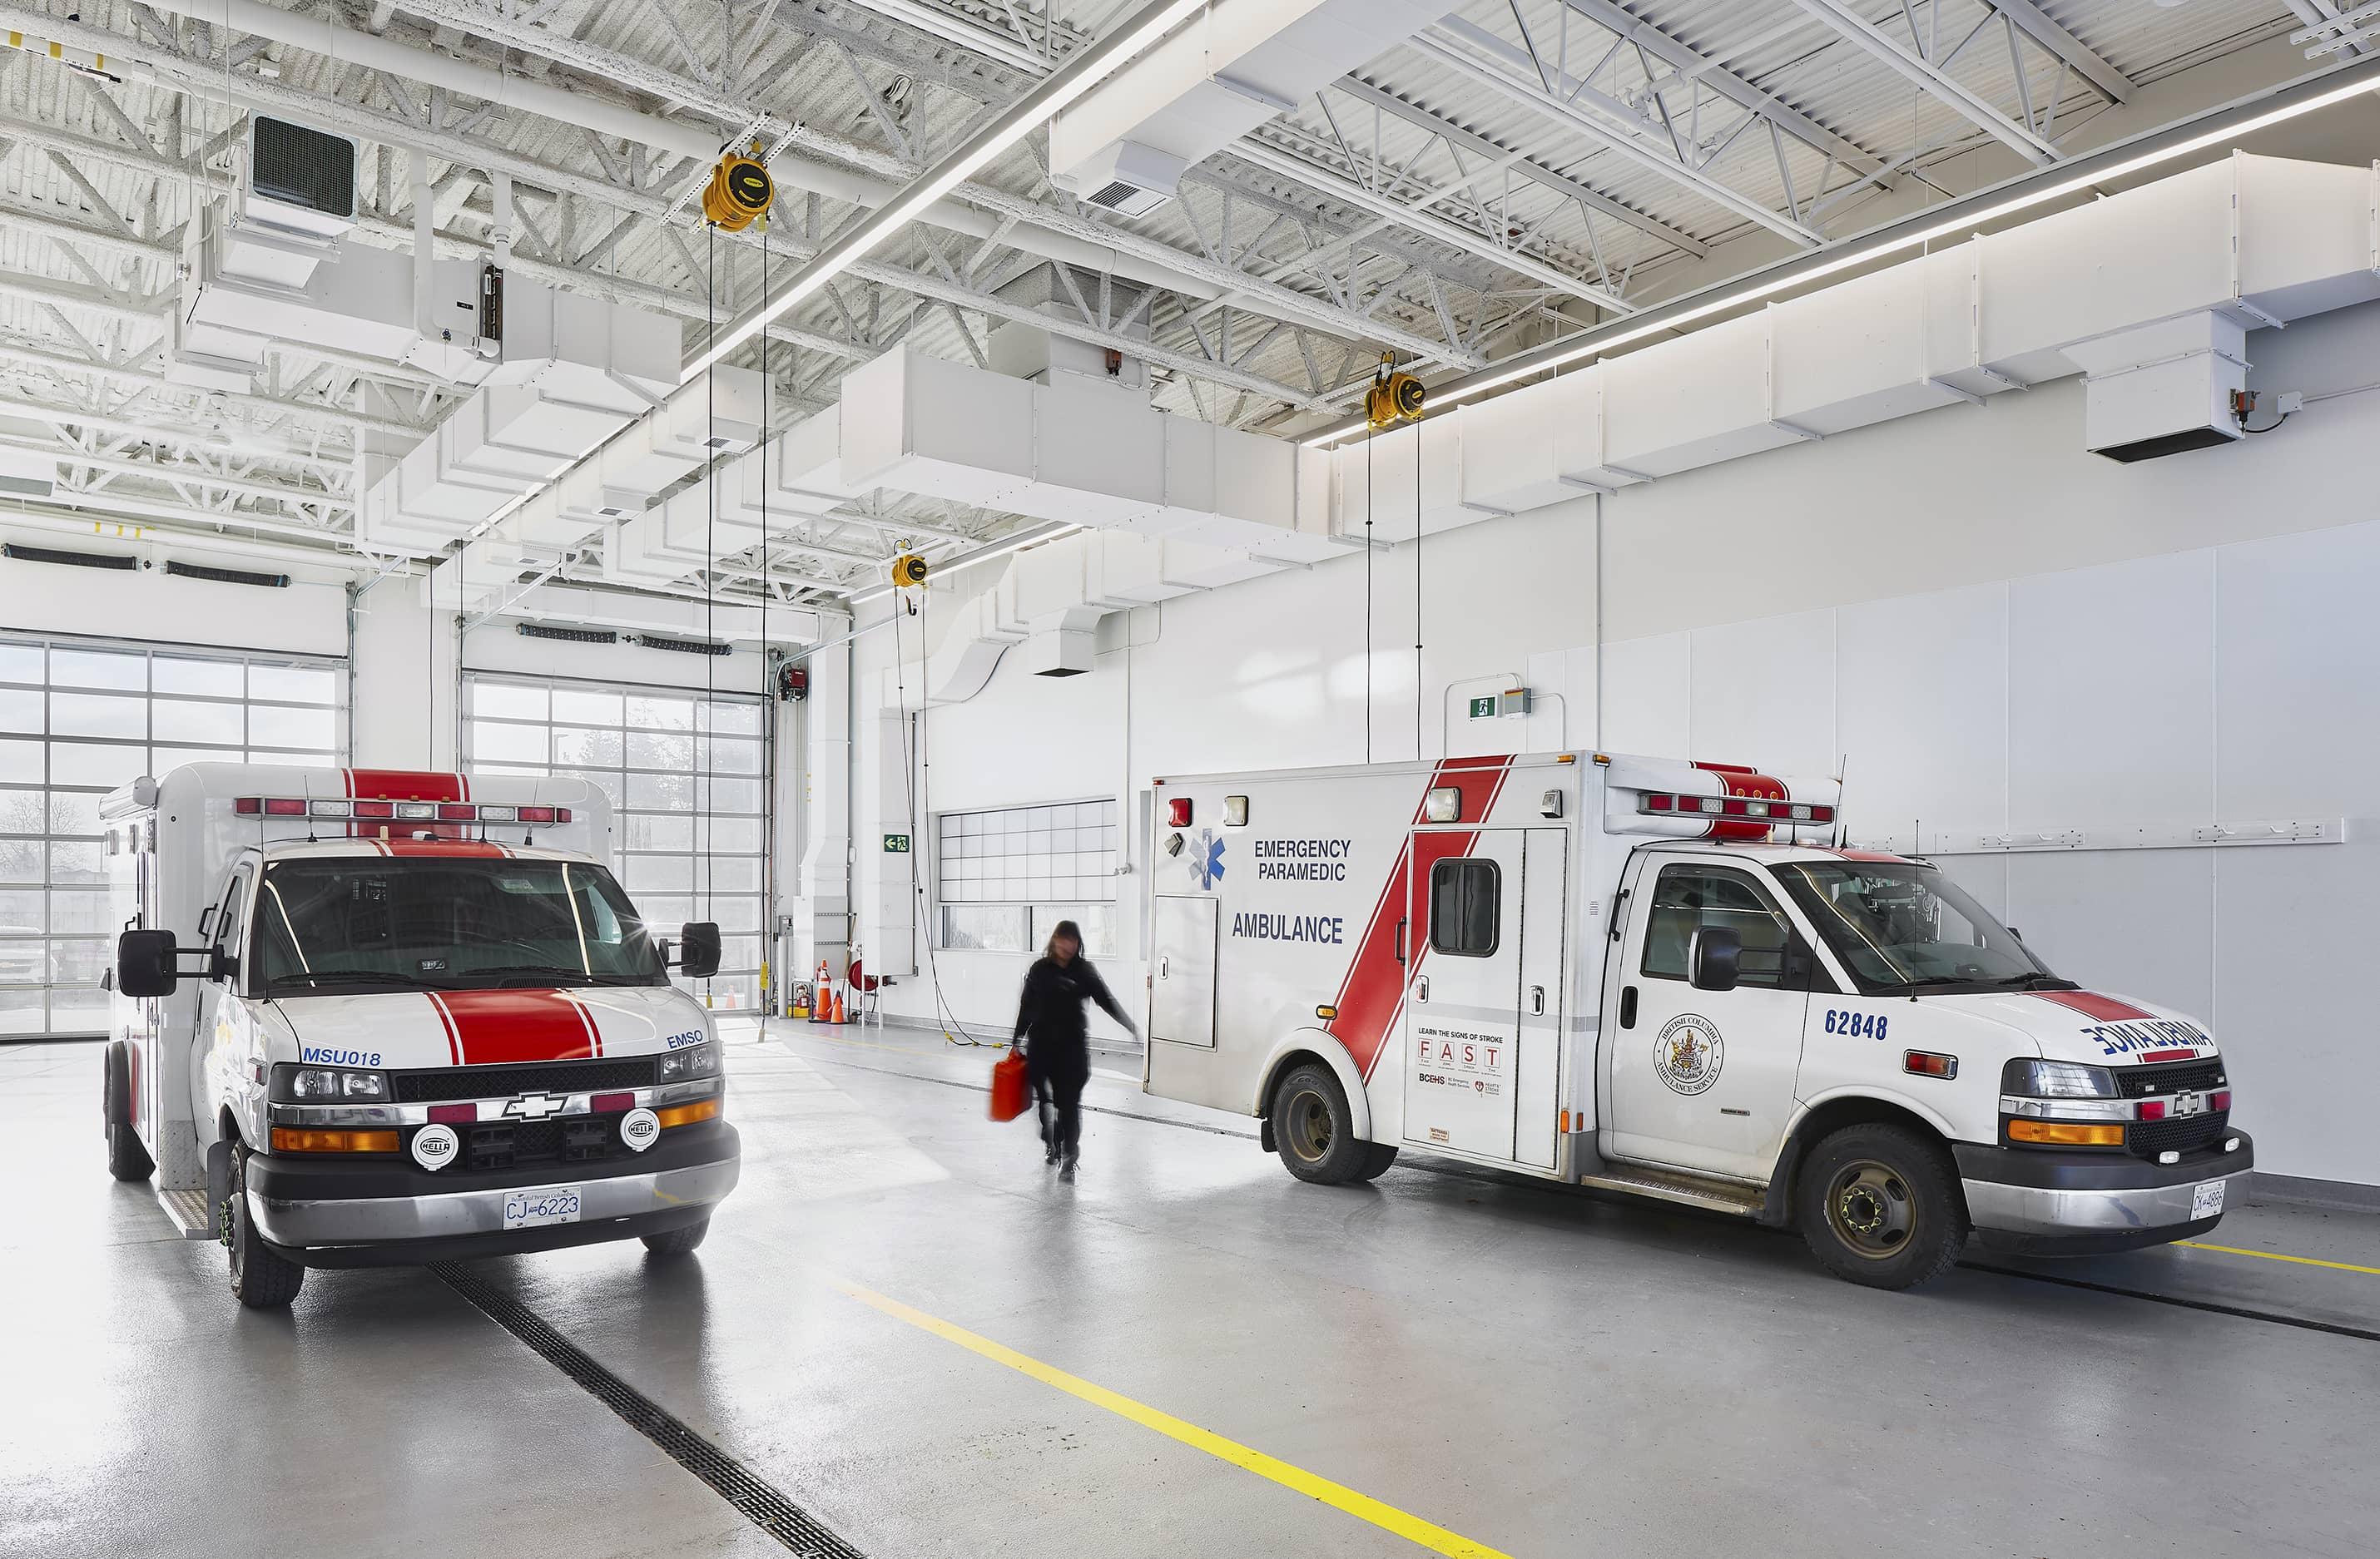 bbp cambie fire hall no. 3 & ambulance station garage 2